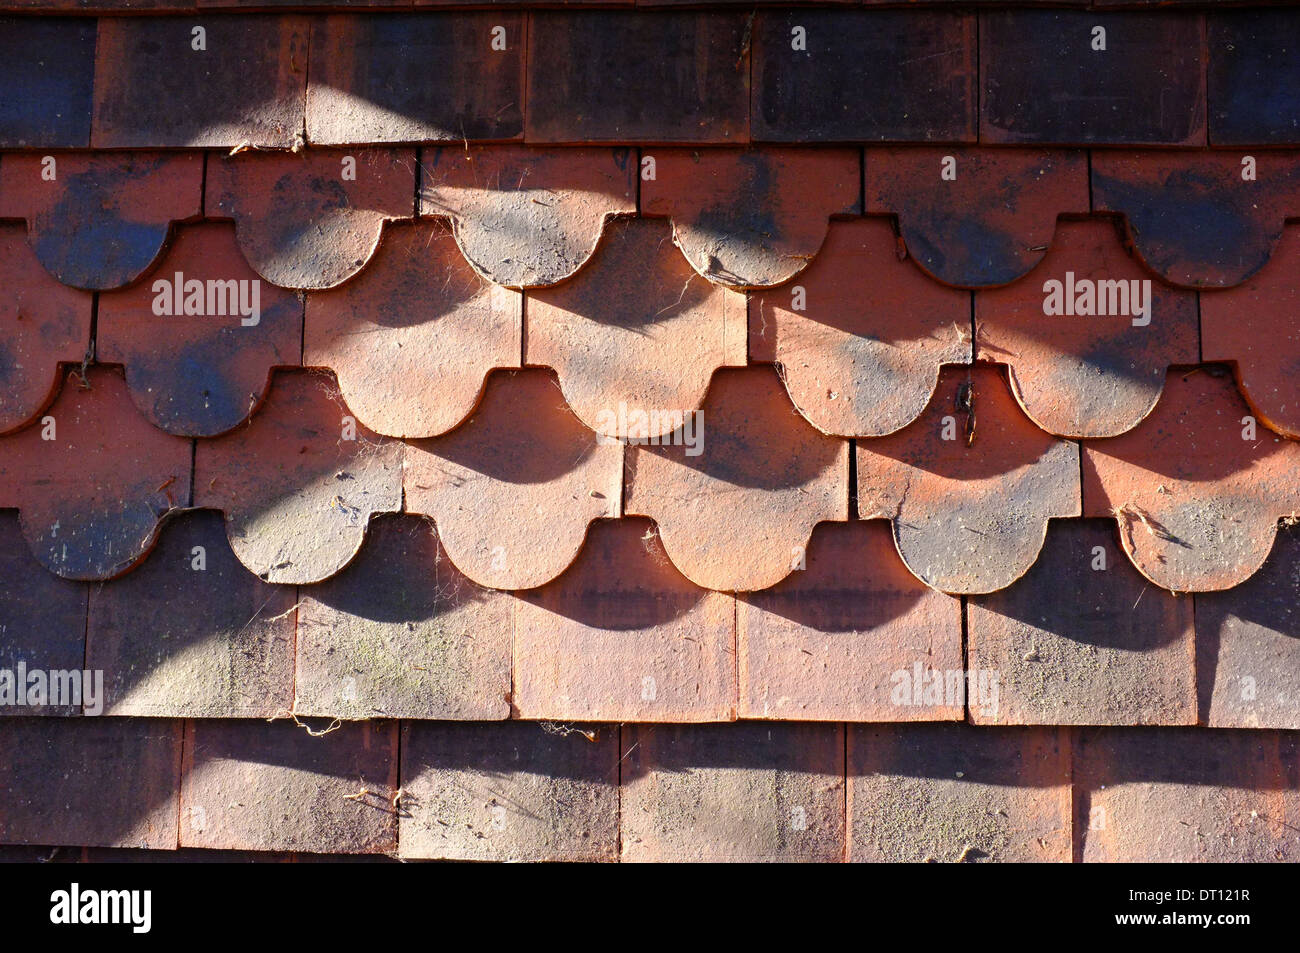 Azulejos de terracota decorativa Imagen De Stock